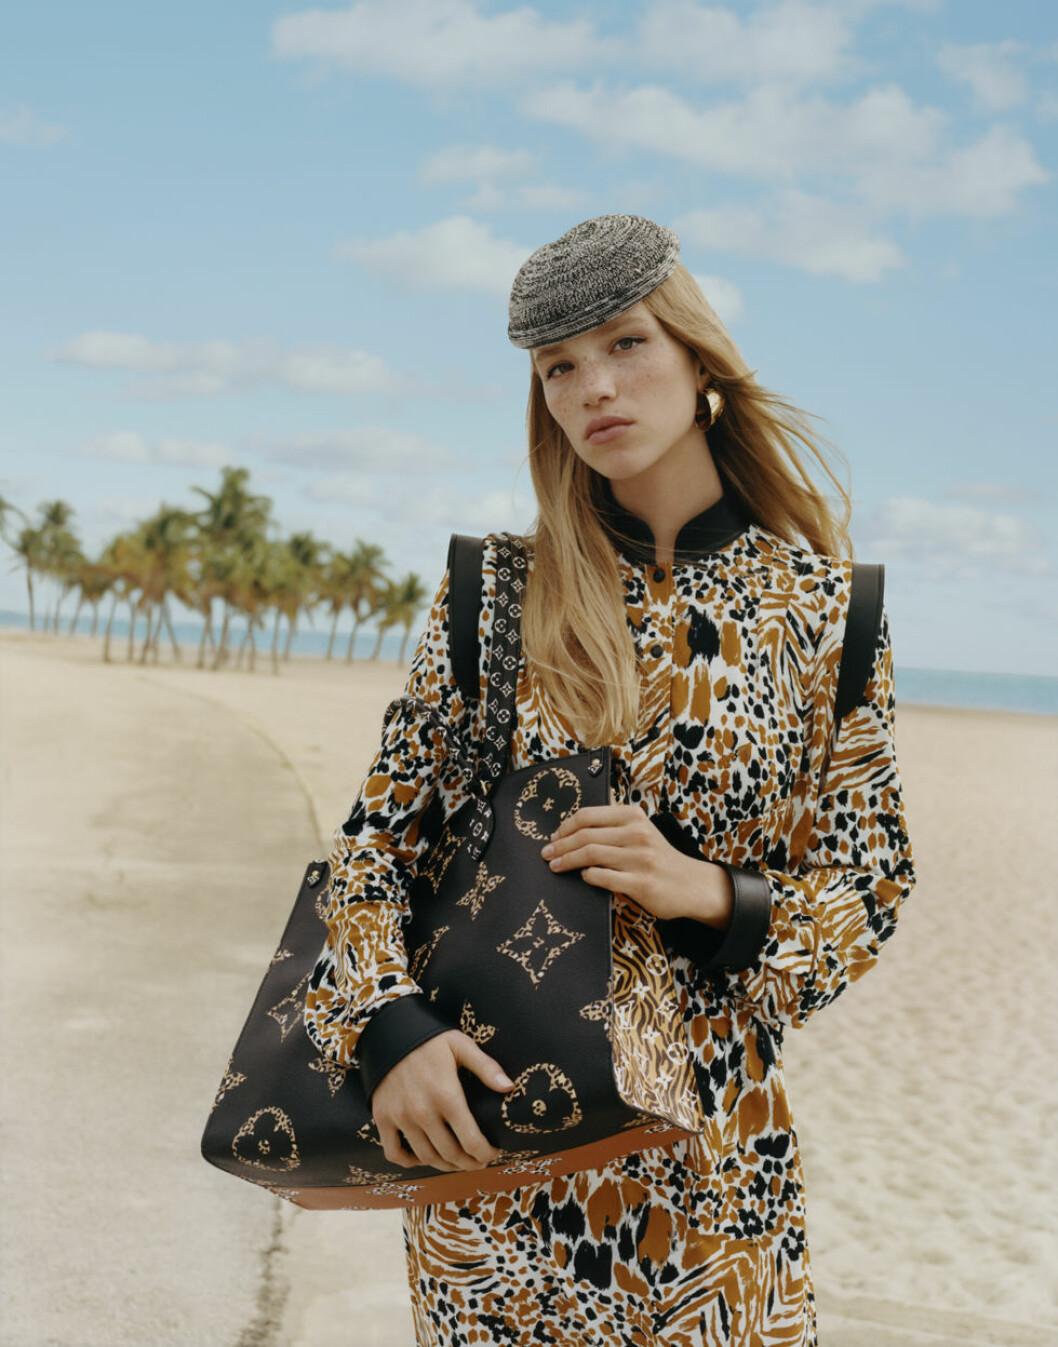 Louis Vuitton Monogram Giant Jungle On the go bag